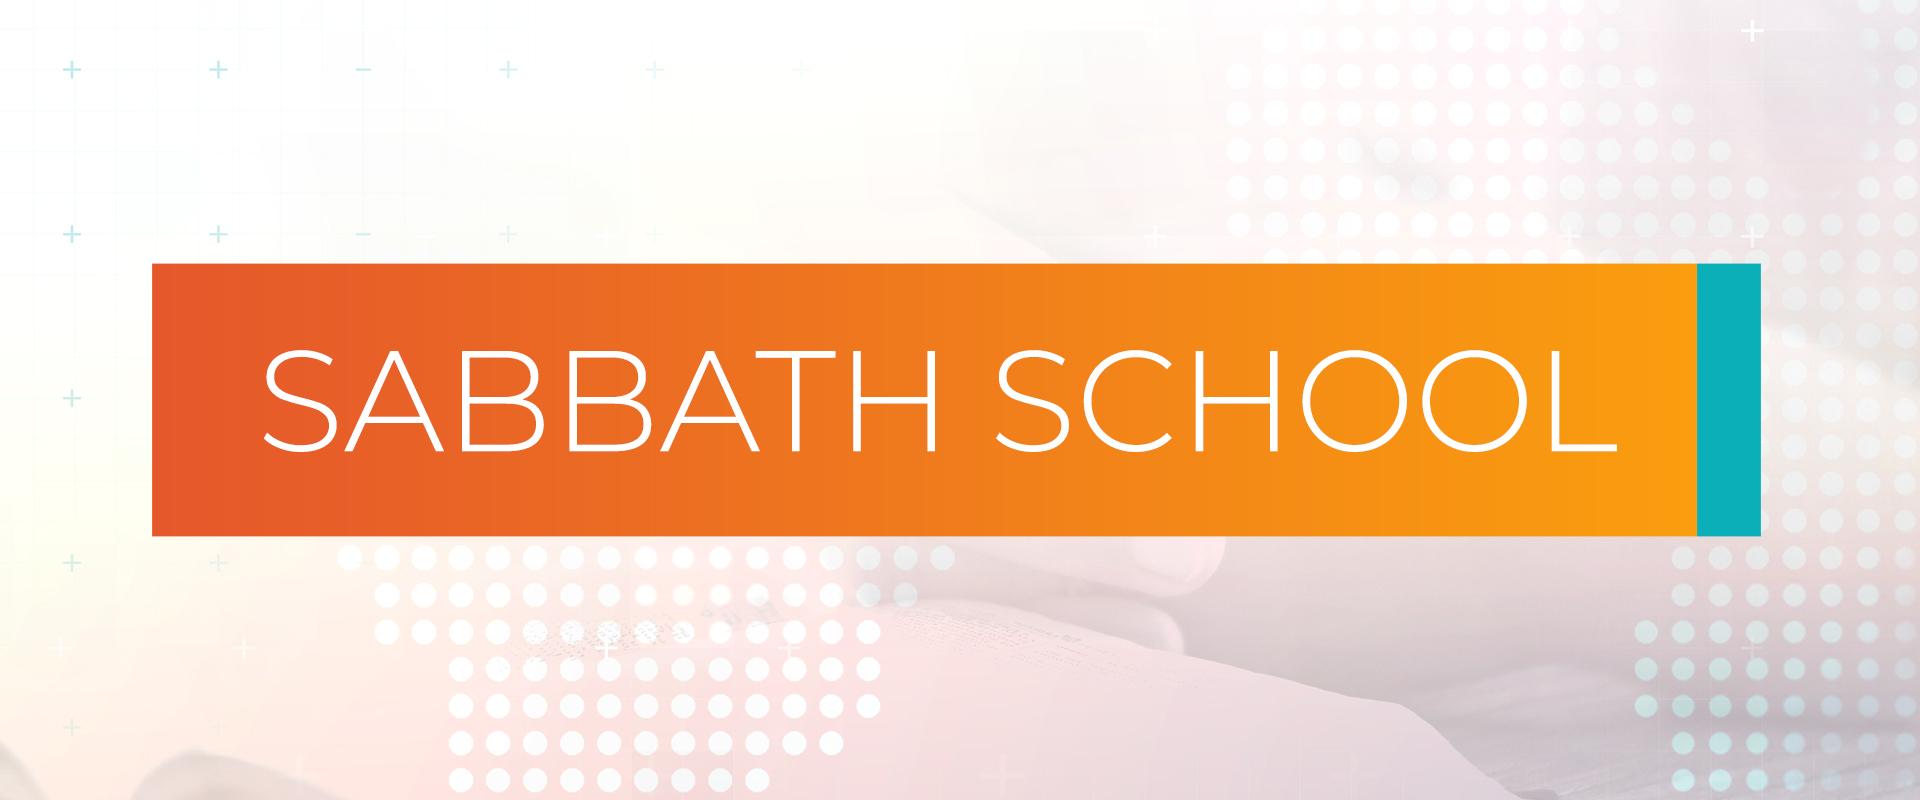 Sabbath School program banner